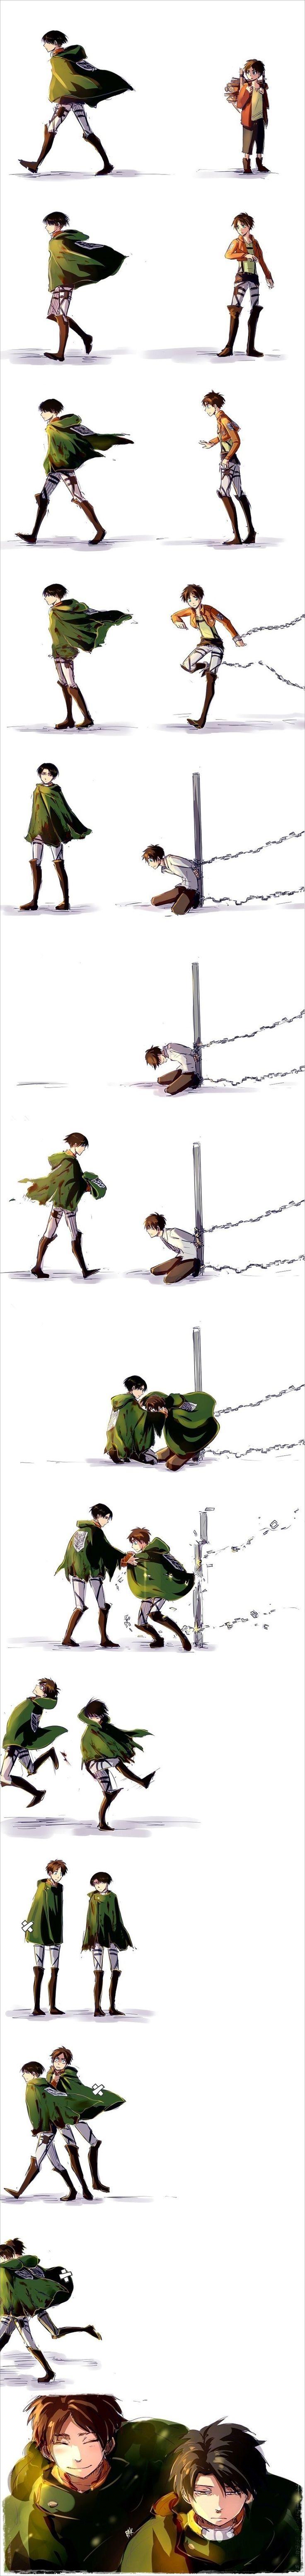 Shingeki no Kyojin - Levi and Eren. It's kinda sad- if you watch Levi's cloak, it slowly gets bloodier.